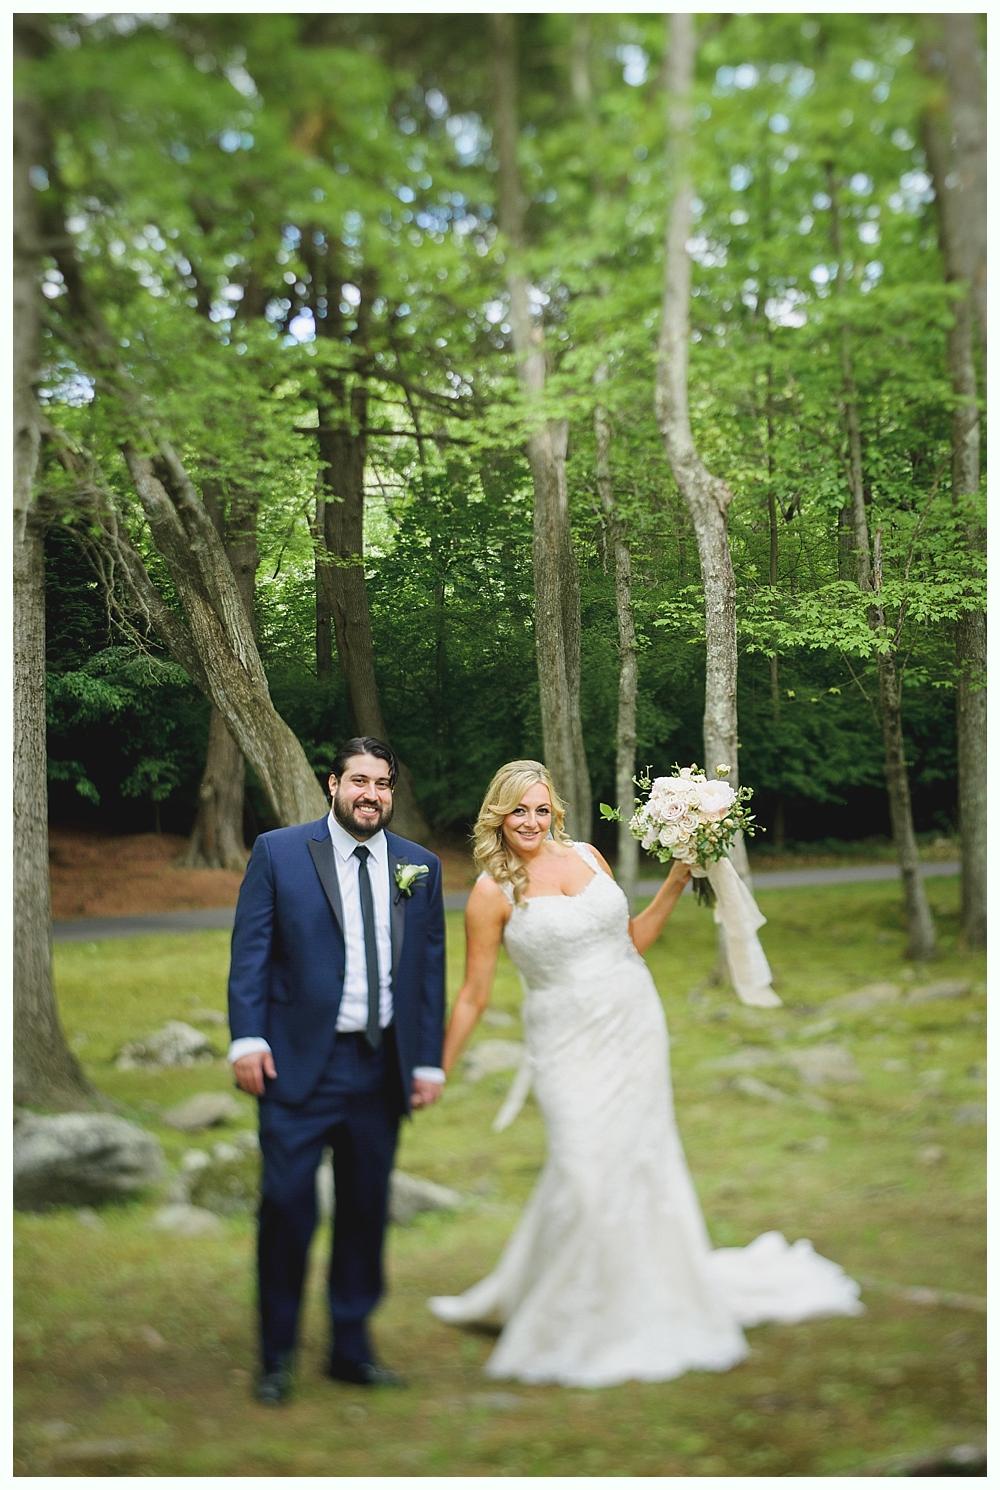 Lord_Thompson_Manor_Wedding_Photography_Luke_Wayne_32